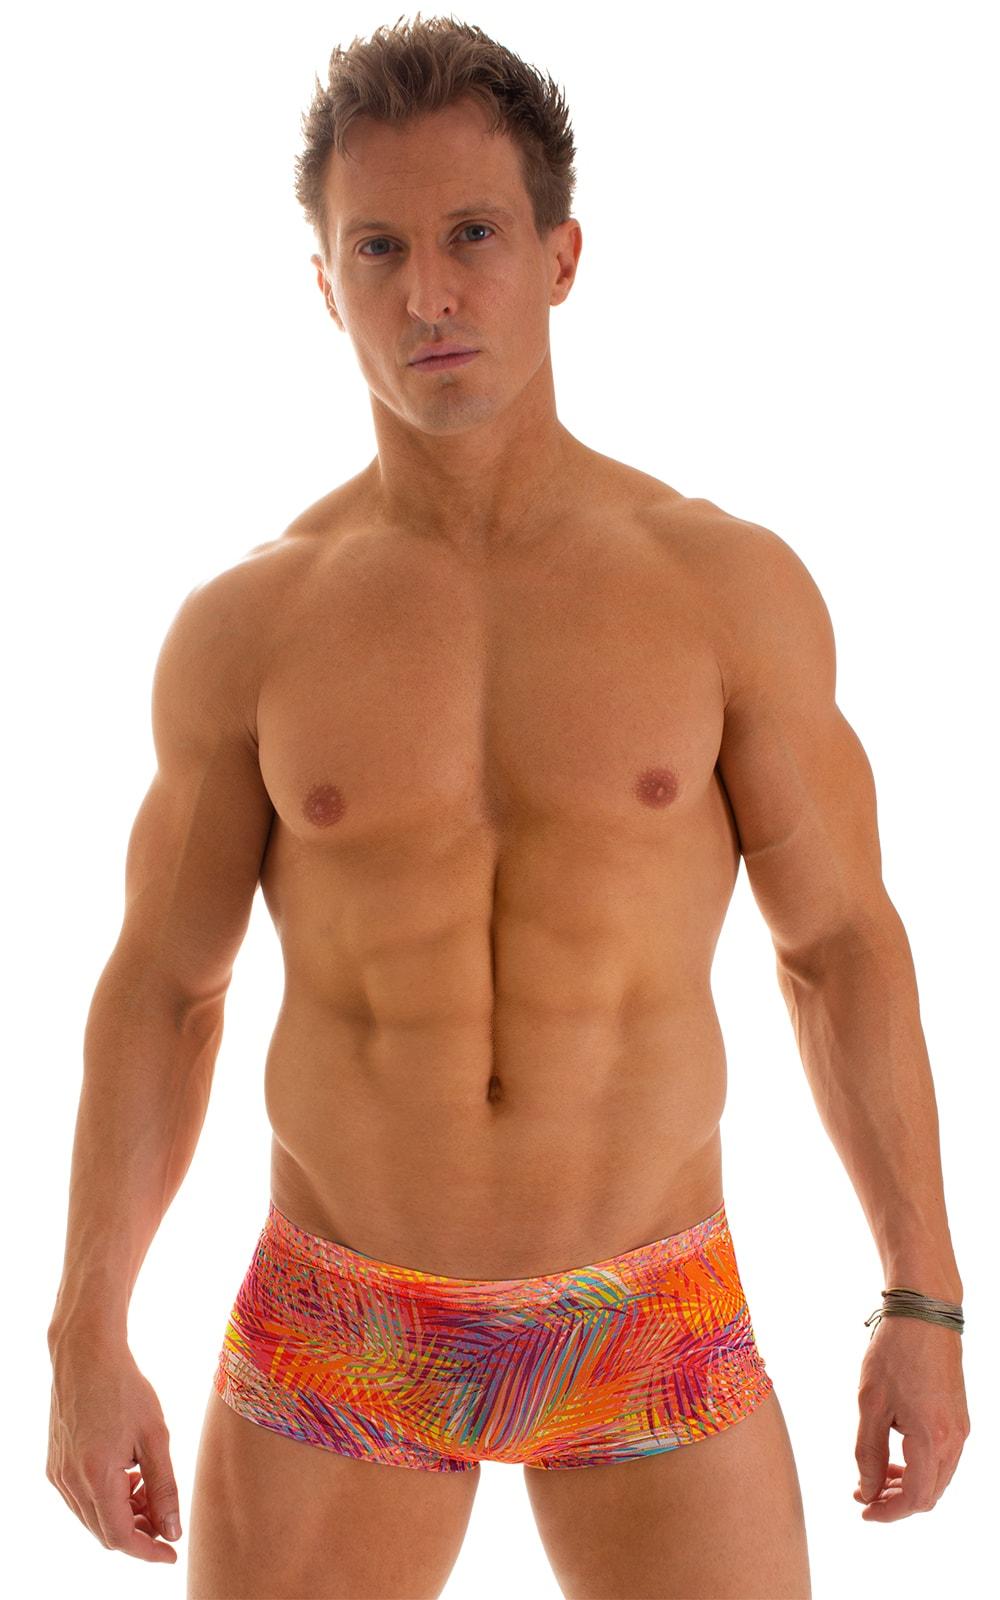 Extreme Low Square Cut Swim Trunks in Tan Through Orange Jungle 1